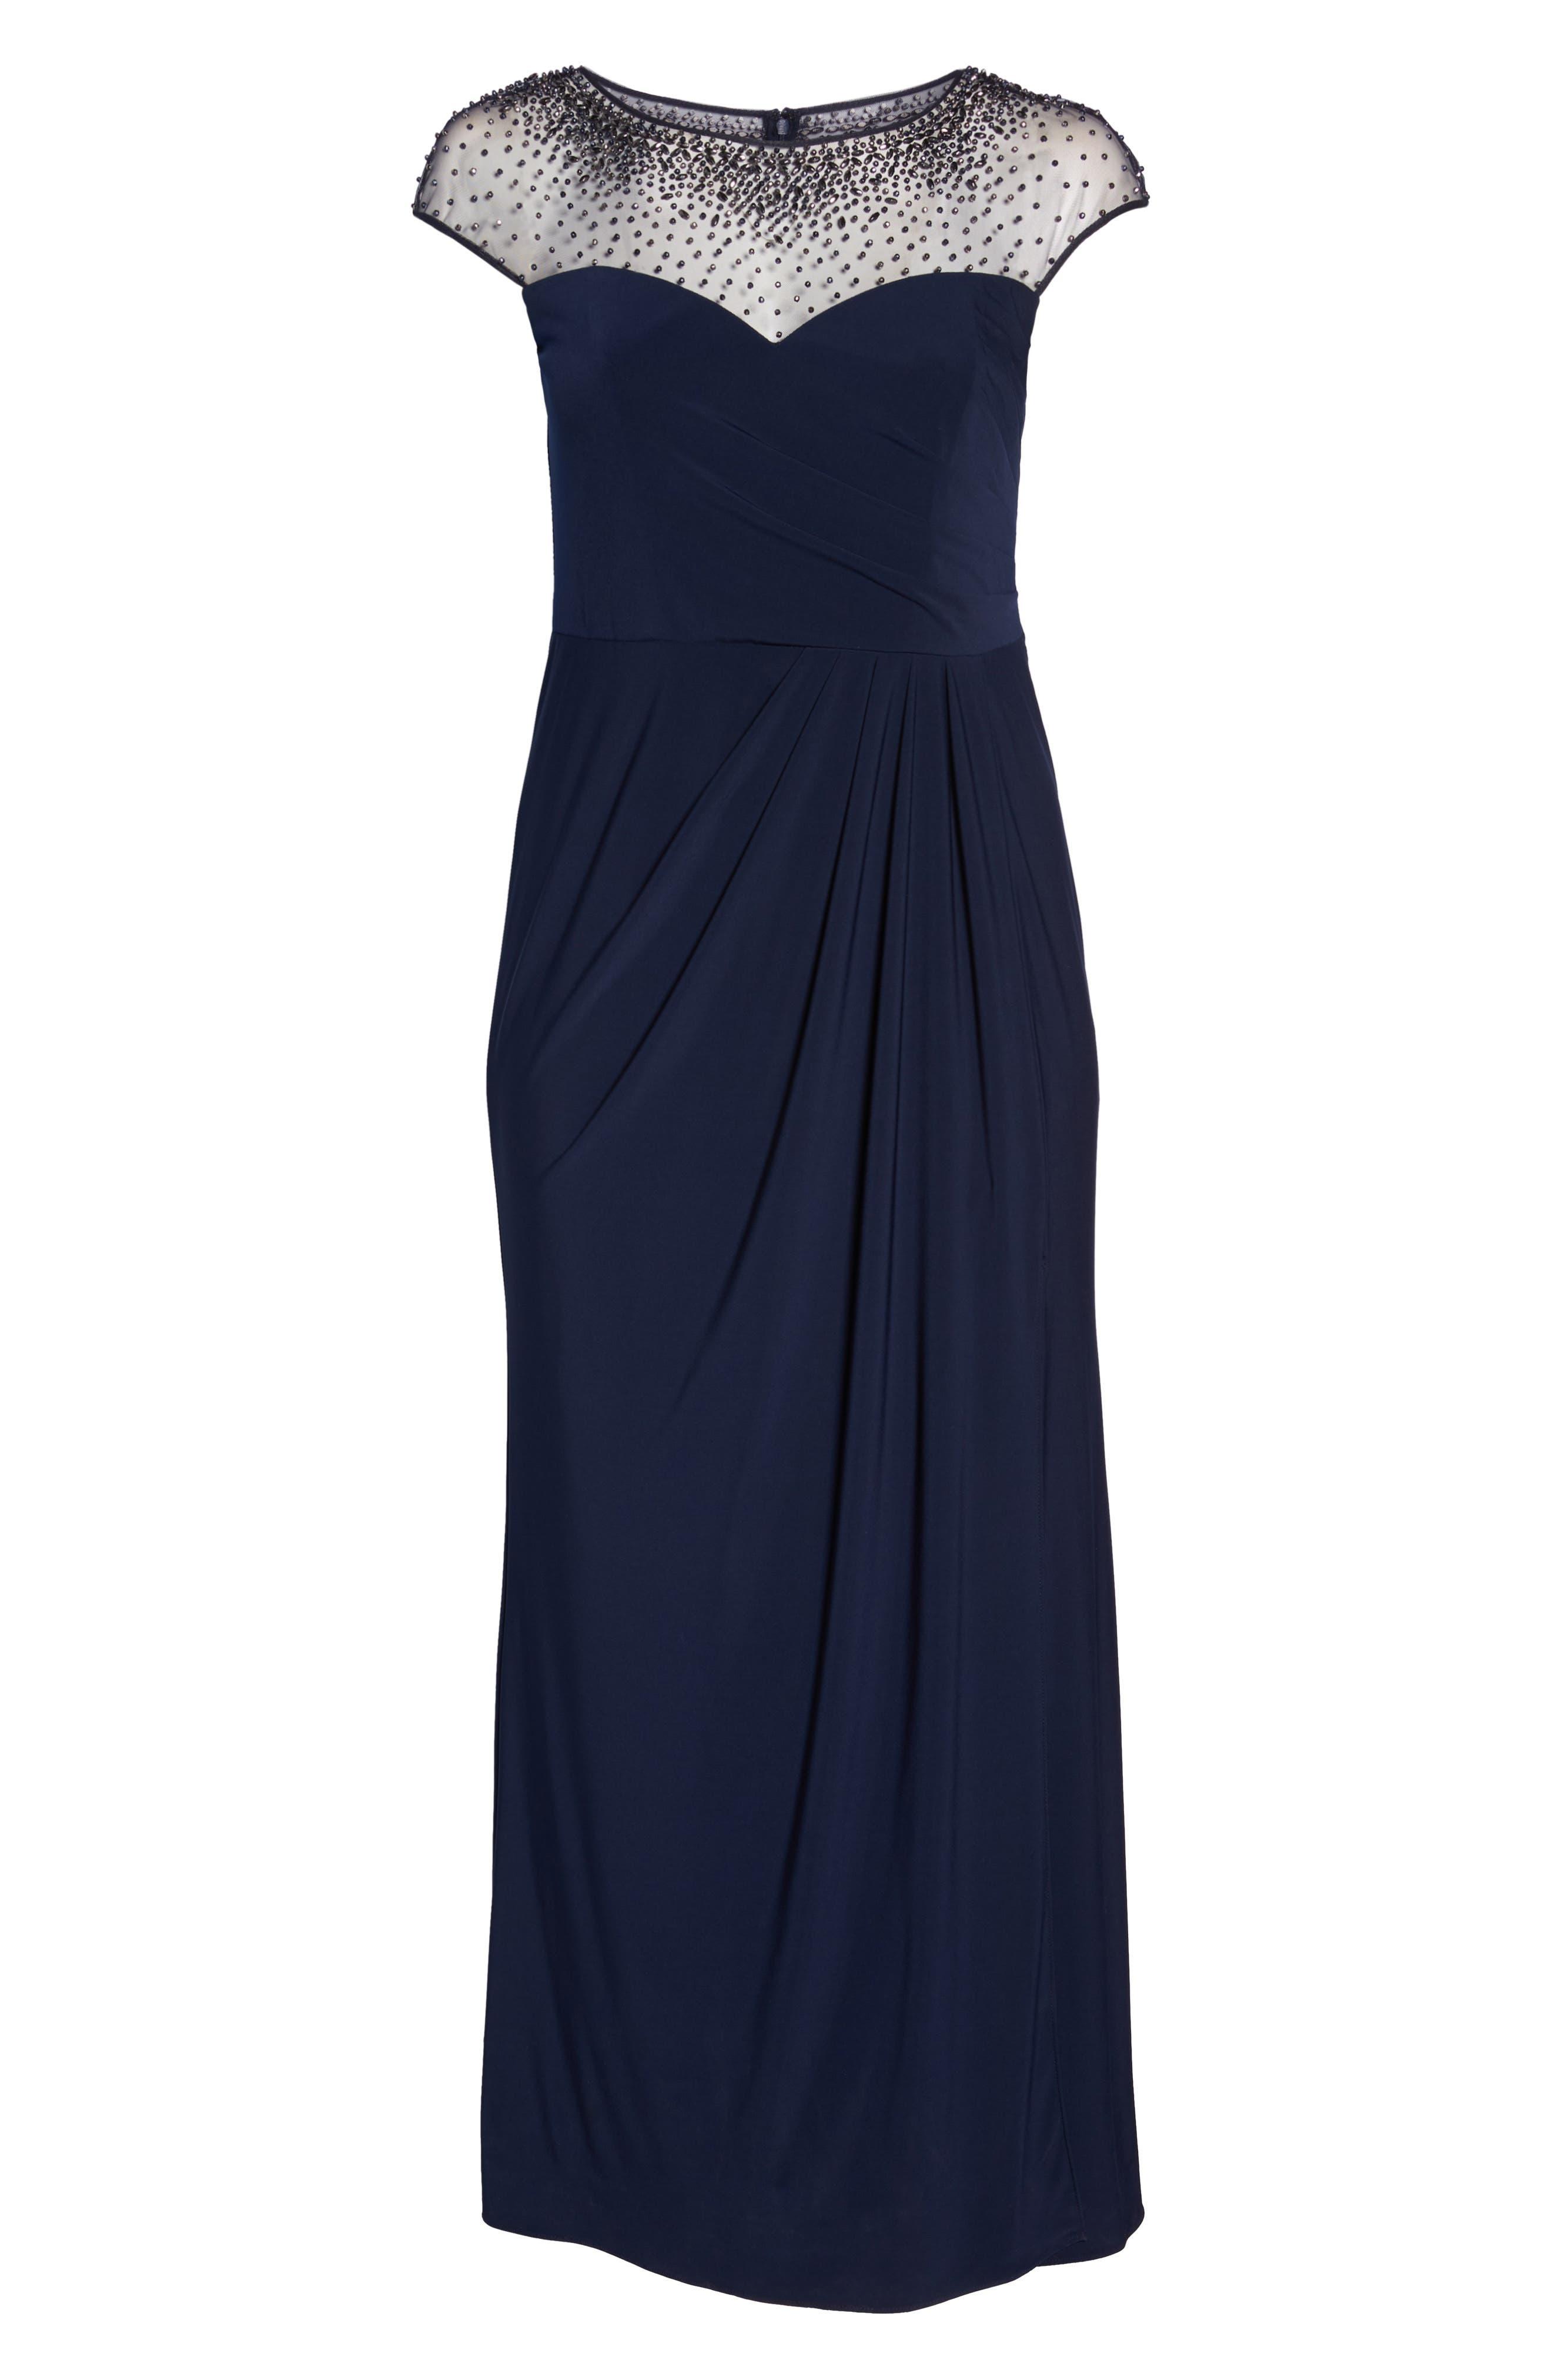 Beaded Faux Wrap Gown,                             Alternate thumbnail 6, color,                             Navy/ Gunmetal